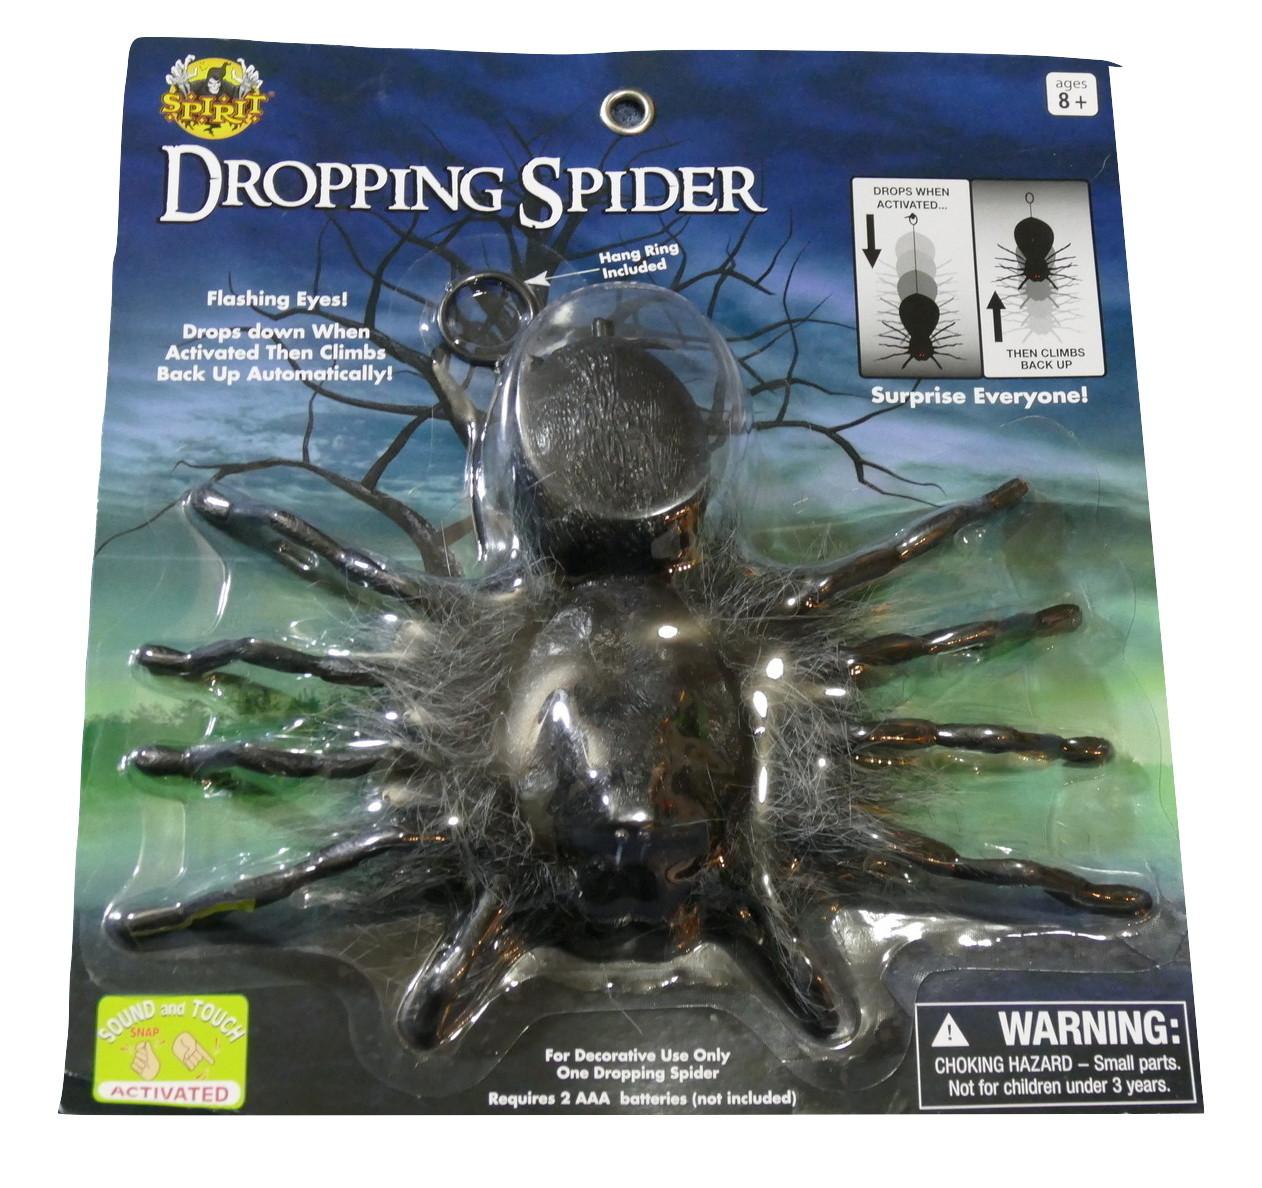 img 5061372172 1510315716 img 5061372172 1510315716 dropping dangling spider spirit halloween decor